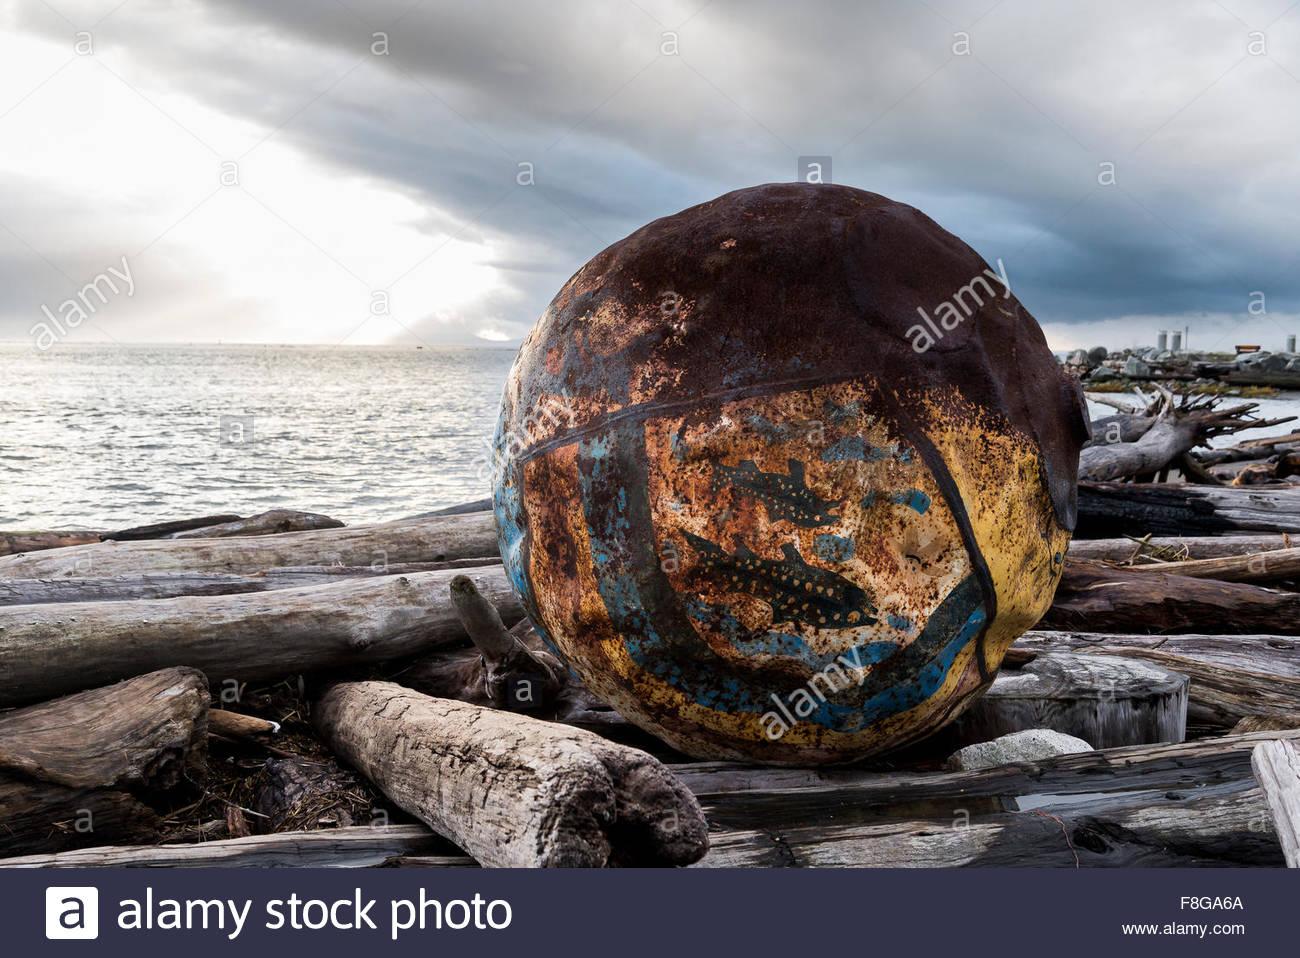 Large float or buoy washed up on shore, Steveston, Richmond, BC, canada - Stock Image